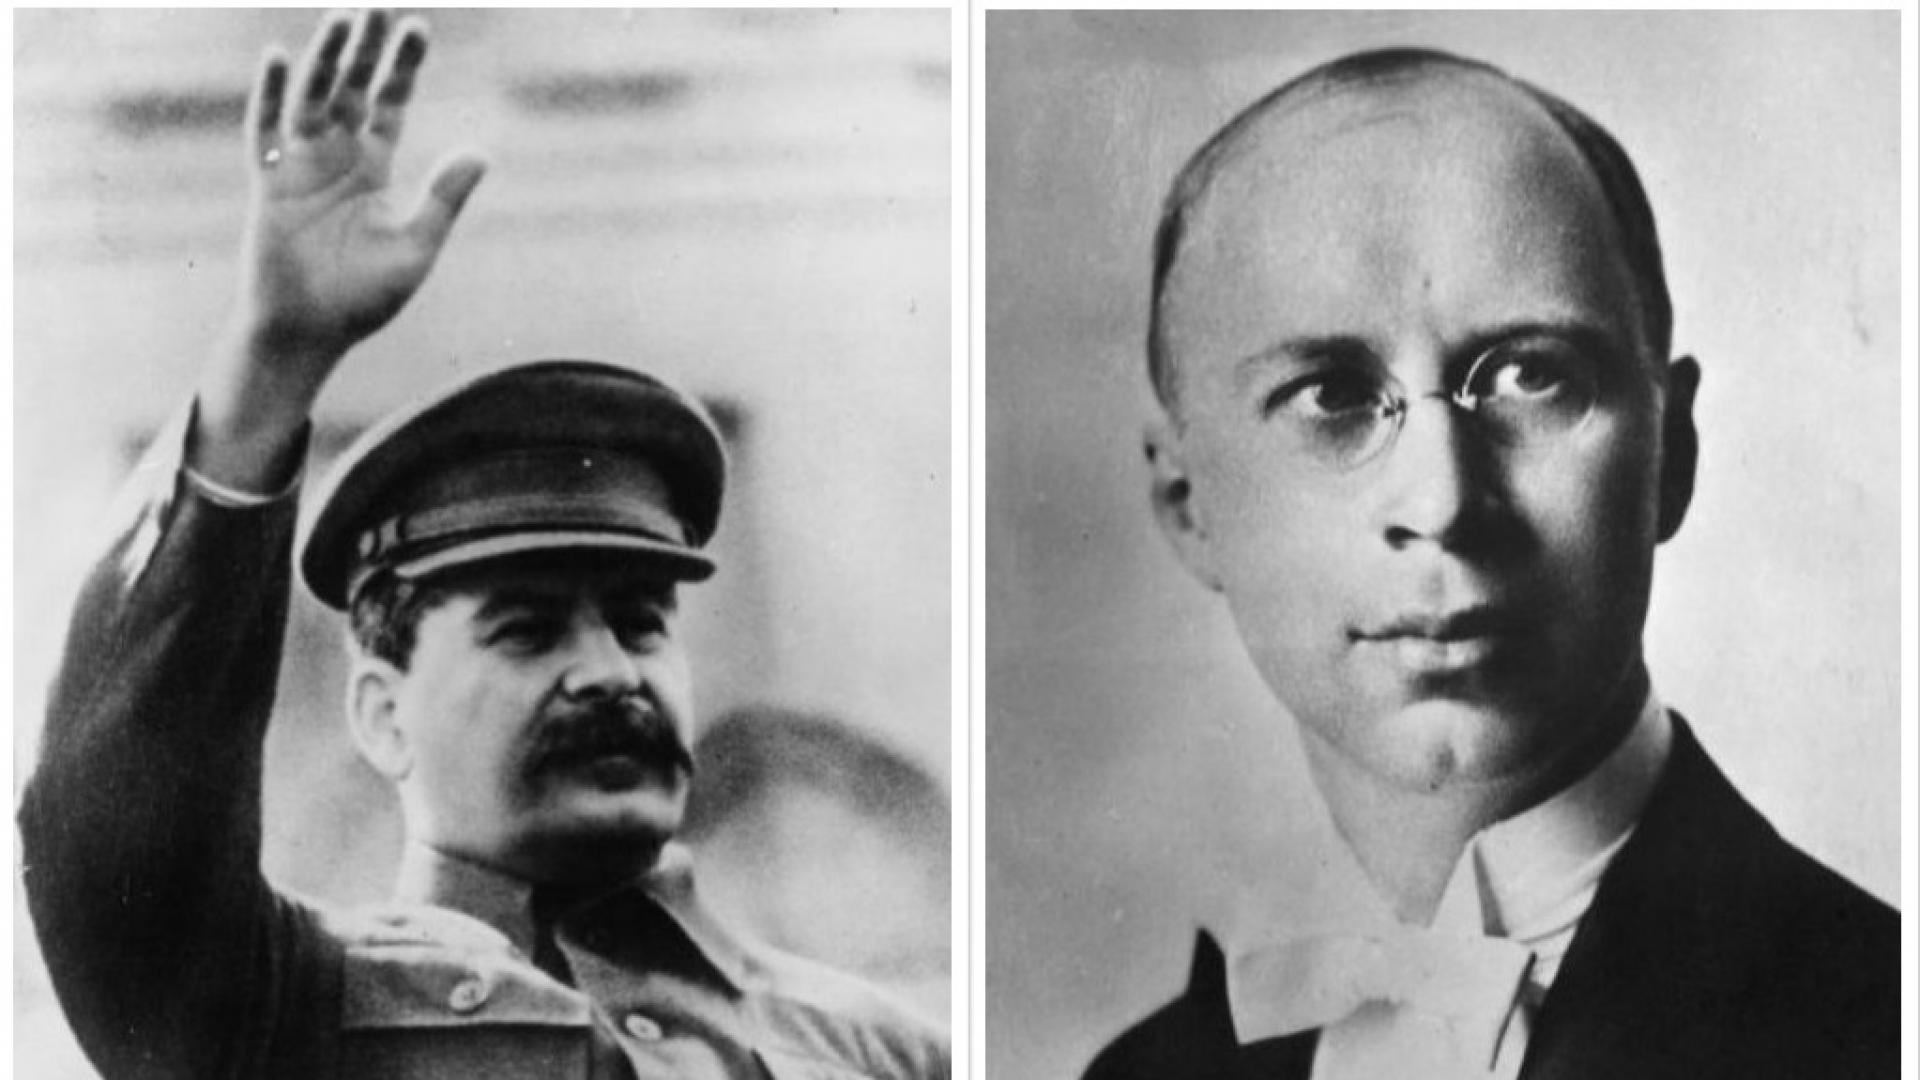 Тоталитарен диктатор и велик композитор - какво би могло да ги обедини?